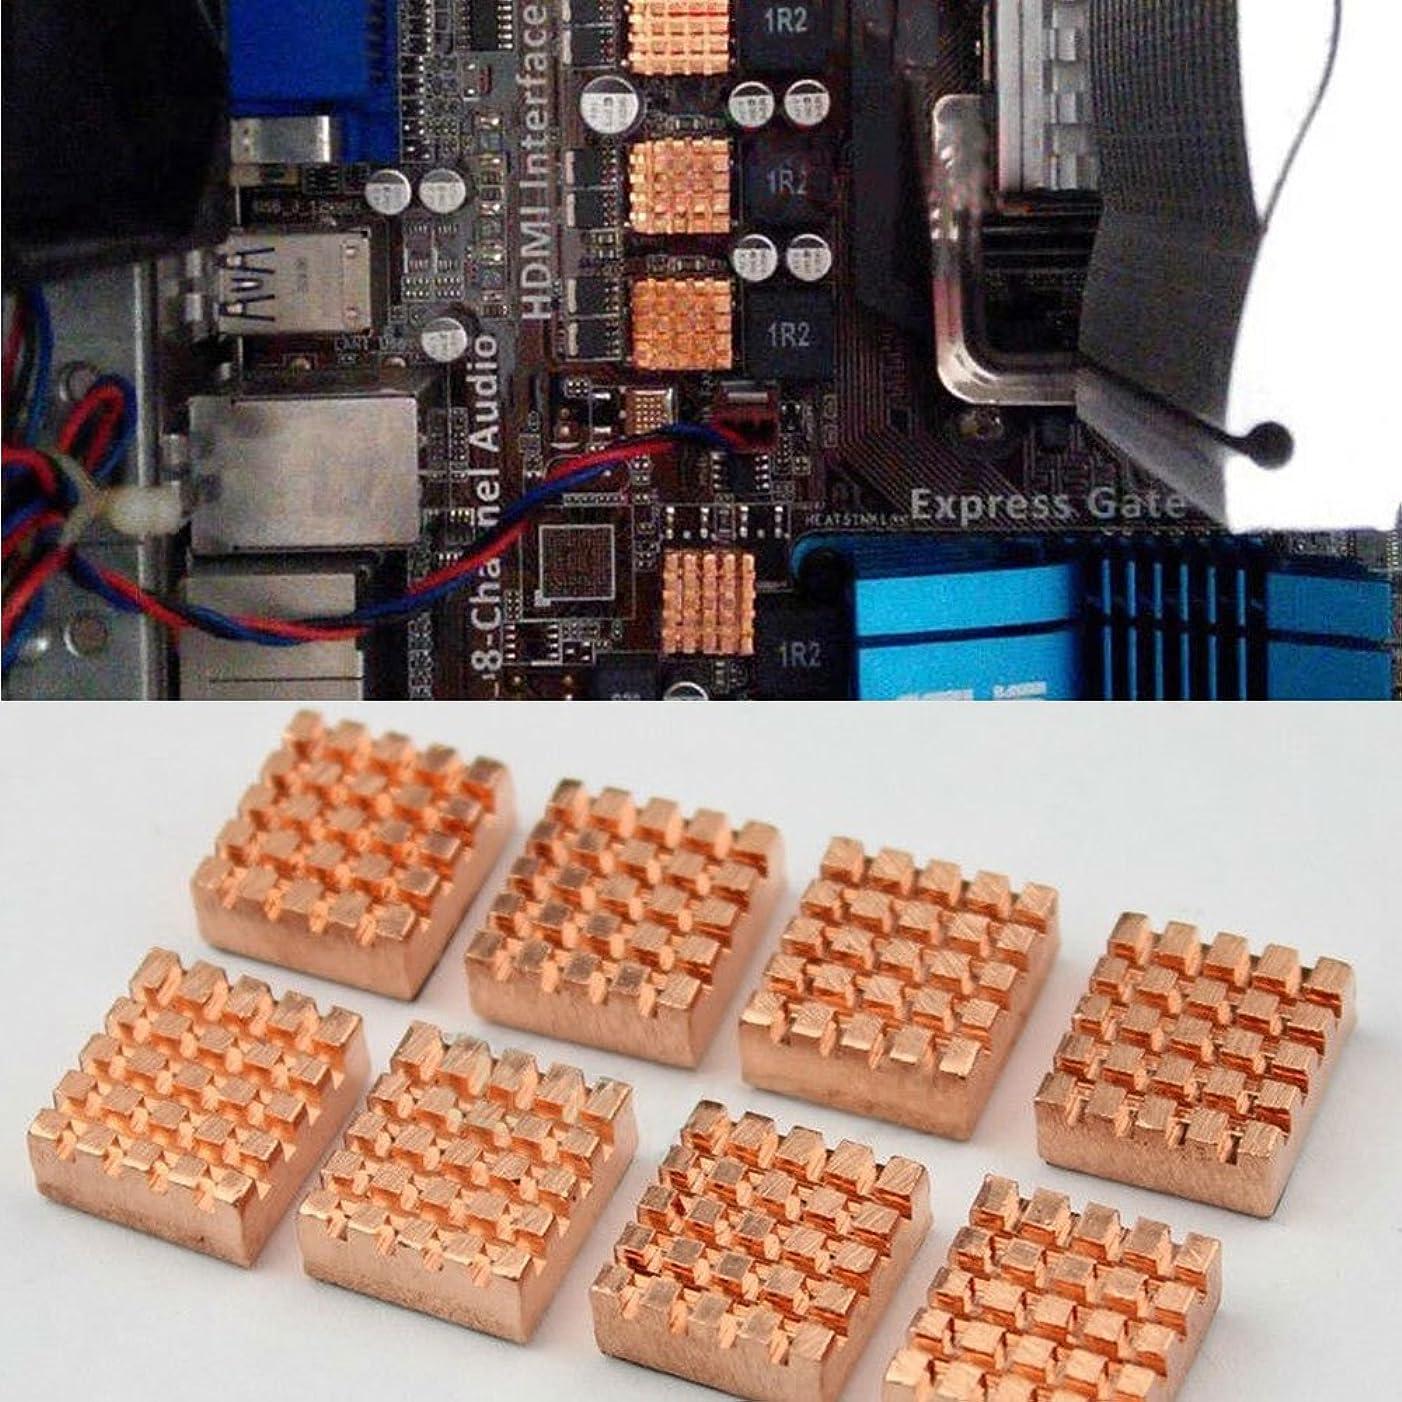 LISRUI 8 Pcs Copper Heatsink CPU Heatsink Motherboard Cooling Fin Memory Bank Coolor Video Memory Components Motherboard Copper